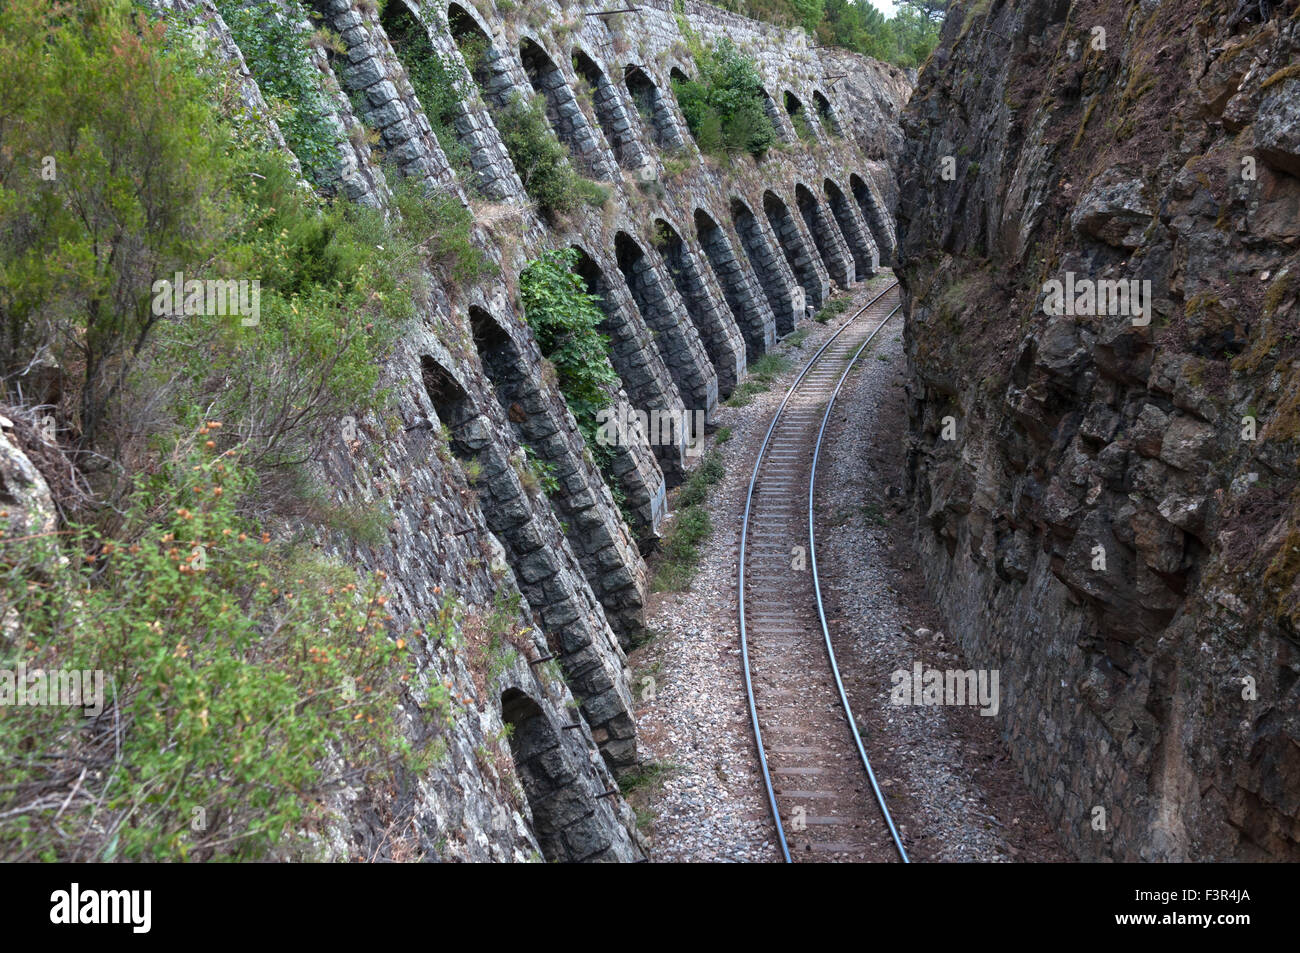 Bottleneck passage close to Ponte du Vecchio rail bridge on Ajaccio-Bastia railway, near Vivario, Corsica, France - Stock Image